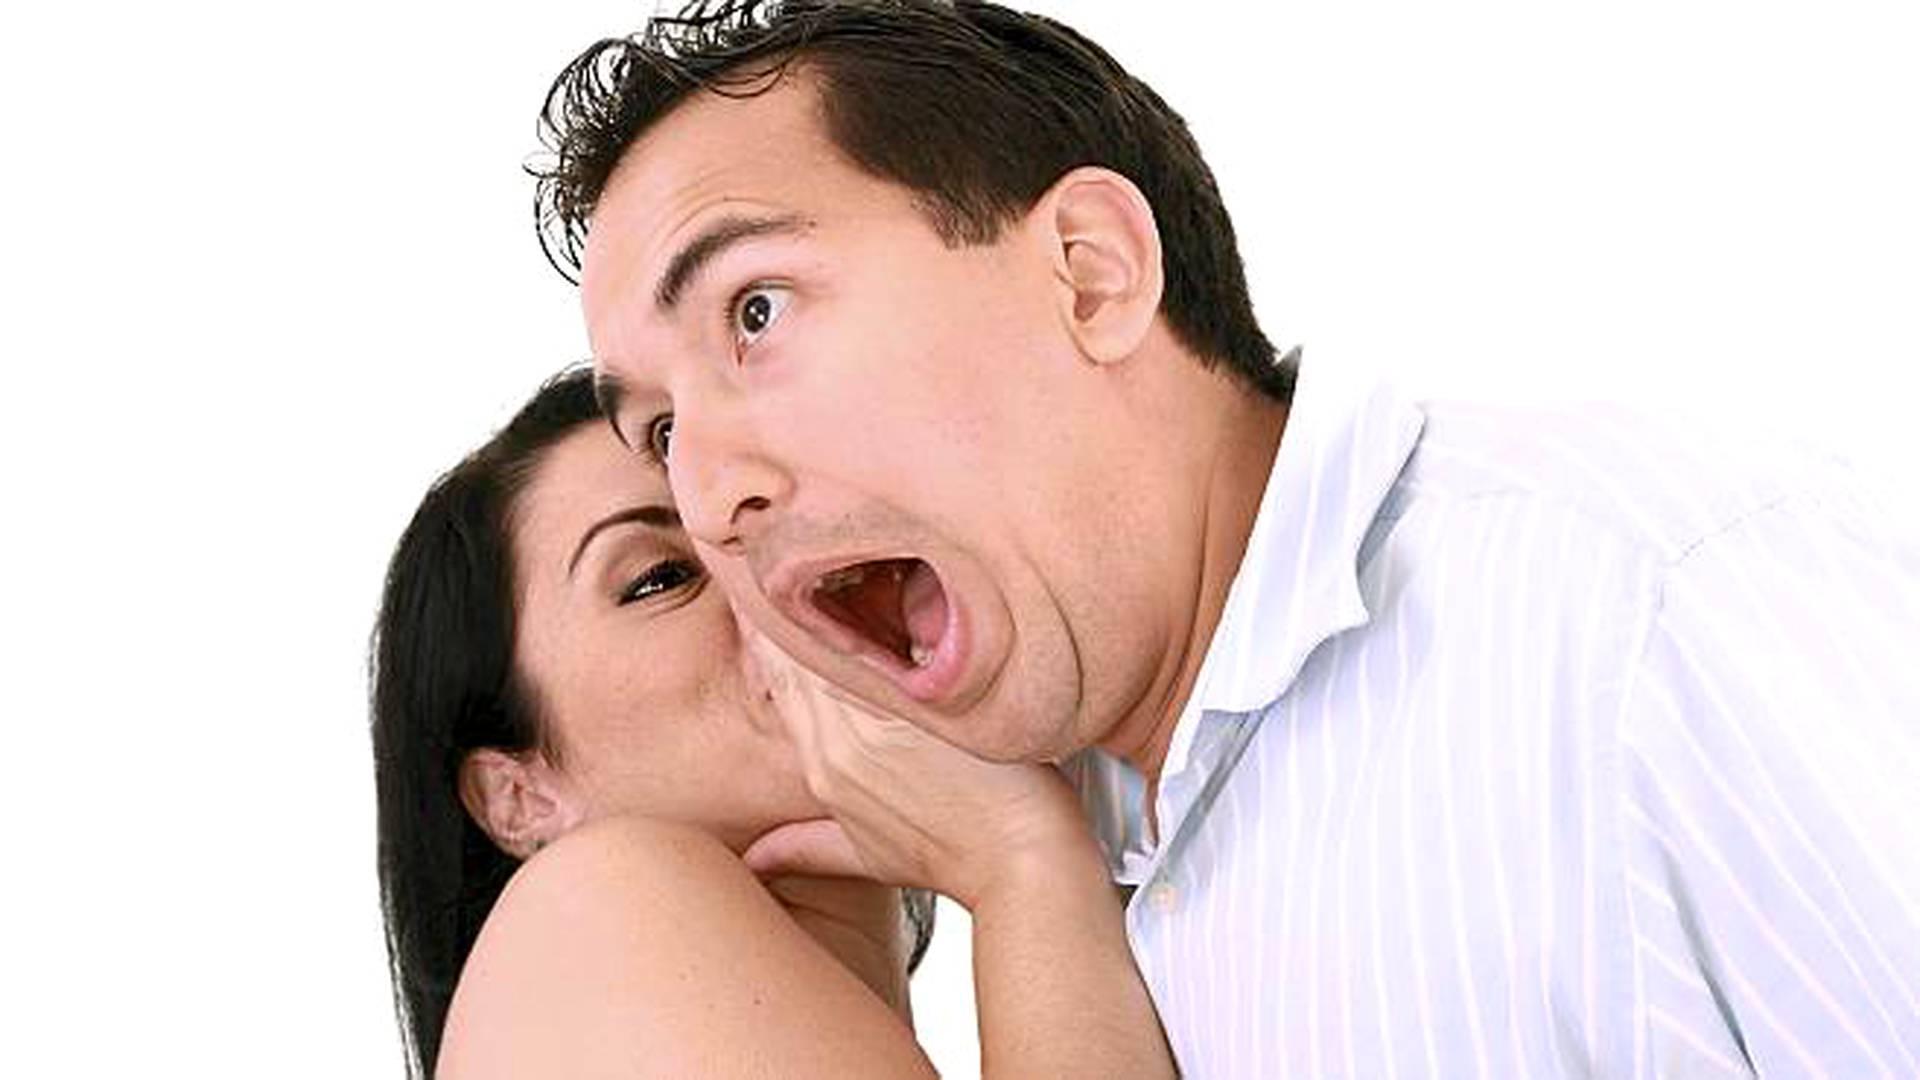 sintonia nopeus dating